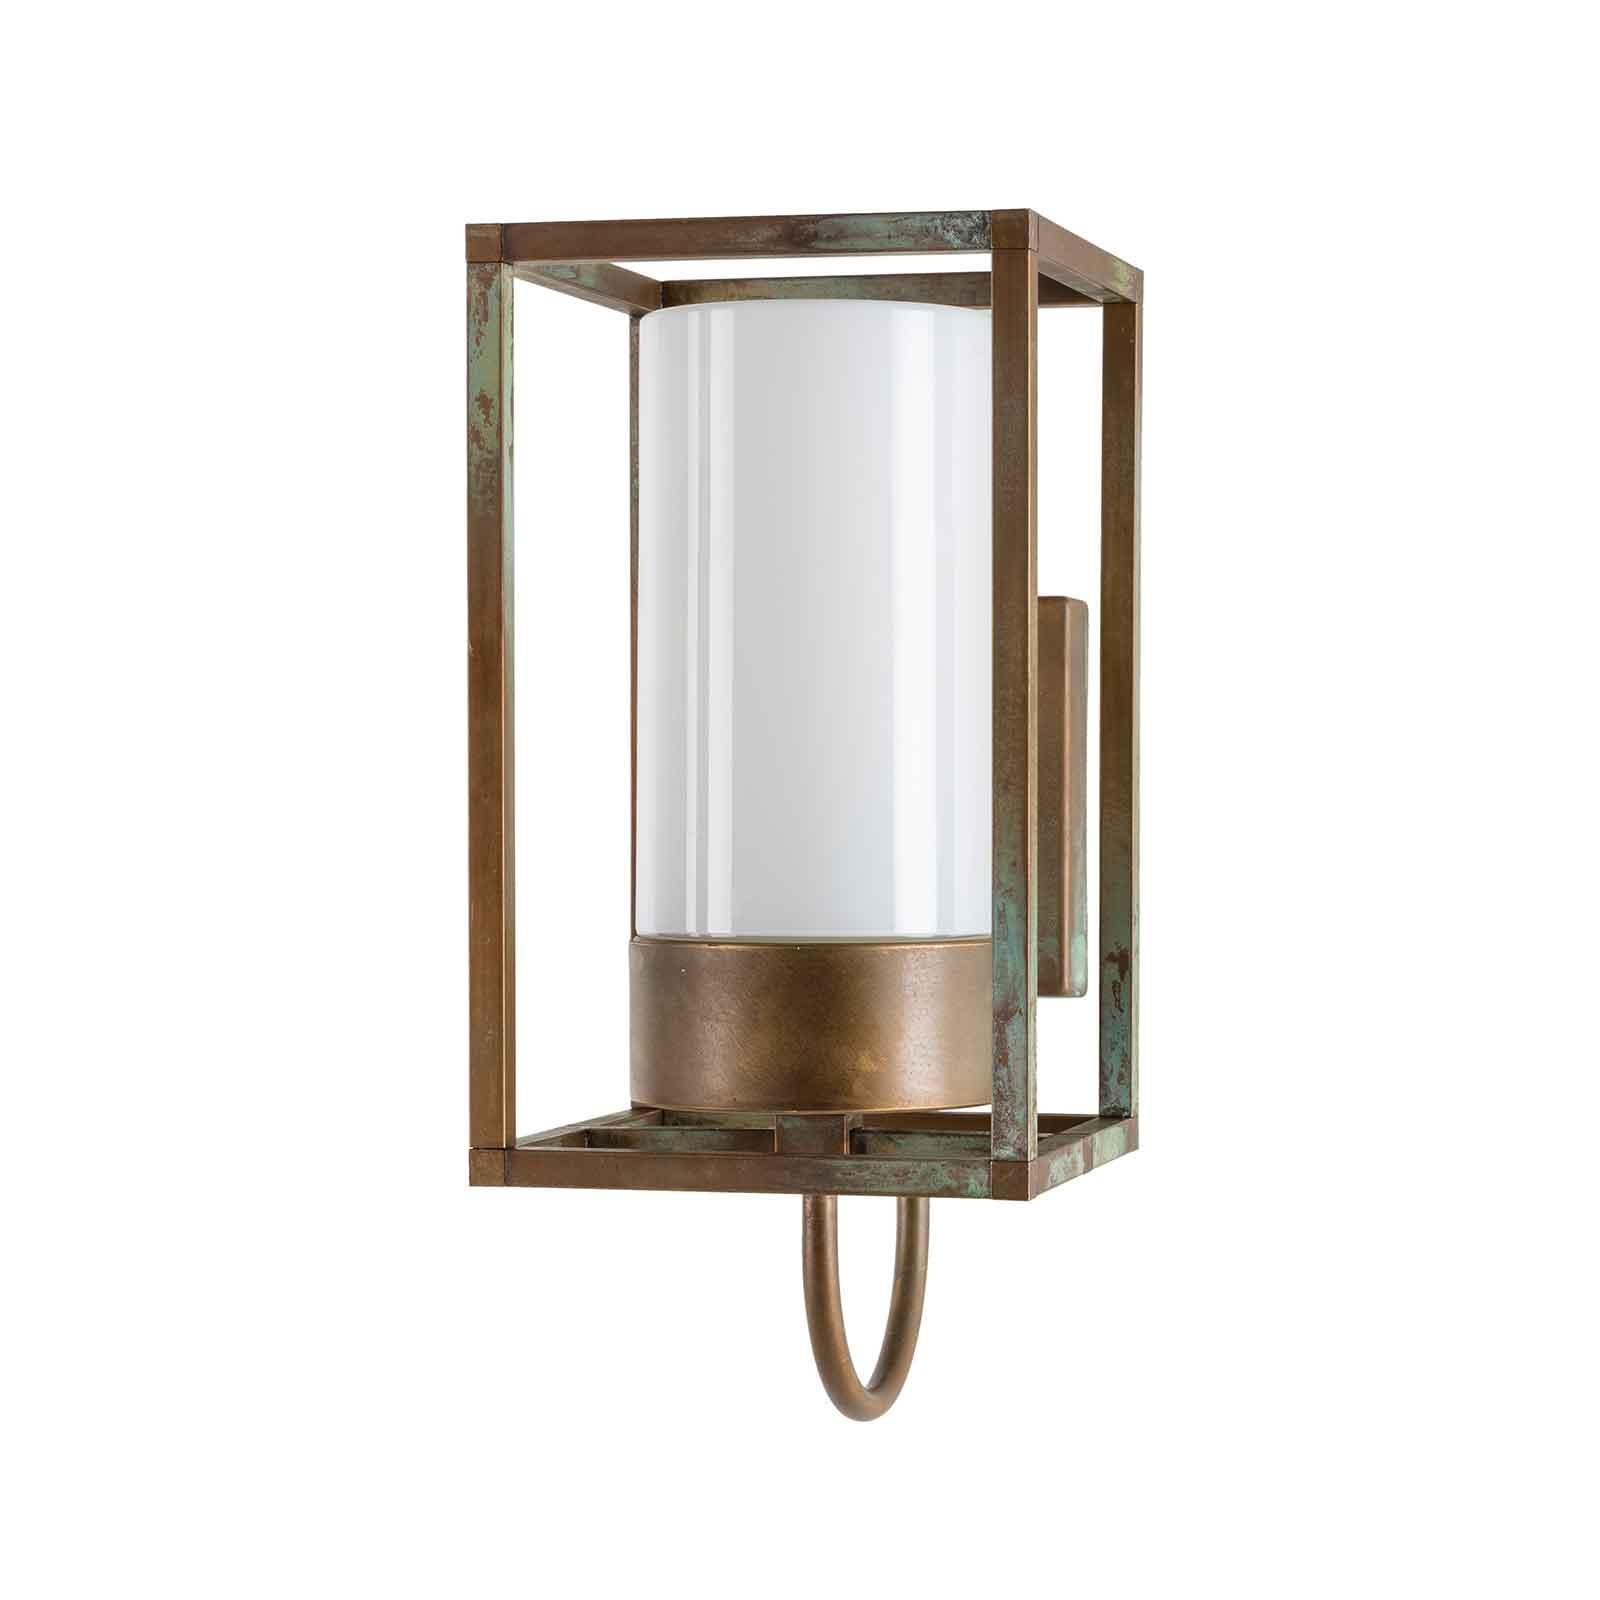 Buitenwandlamp Cubic³ 3362 messing antiek/opaal